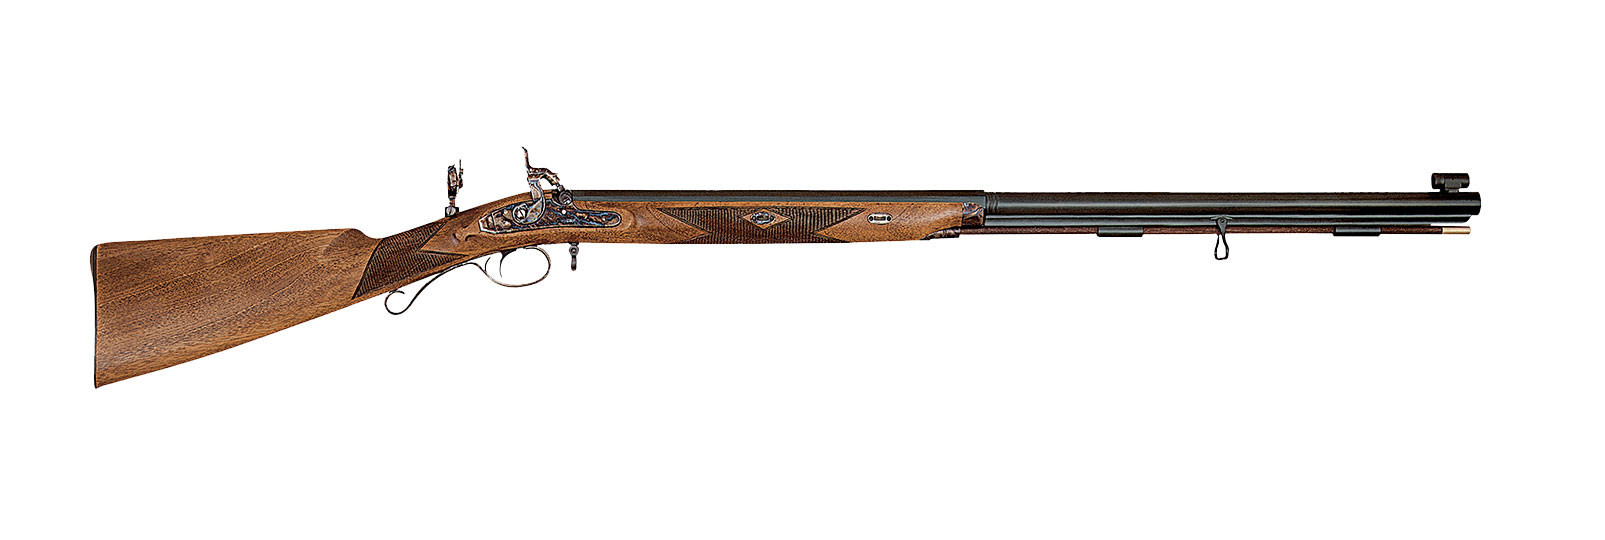 Mortimer Whitworth Rifle